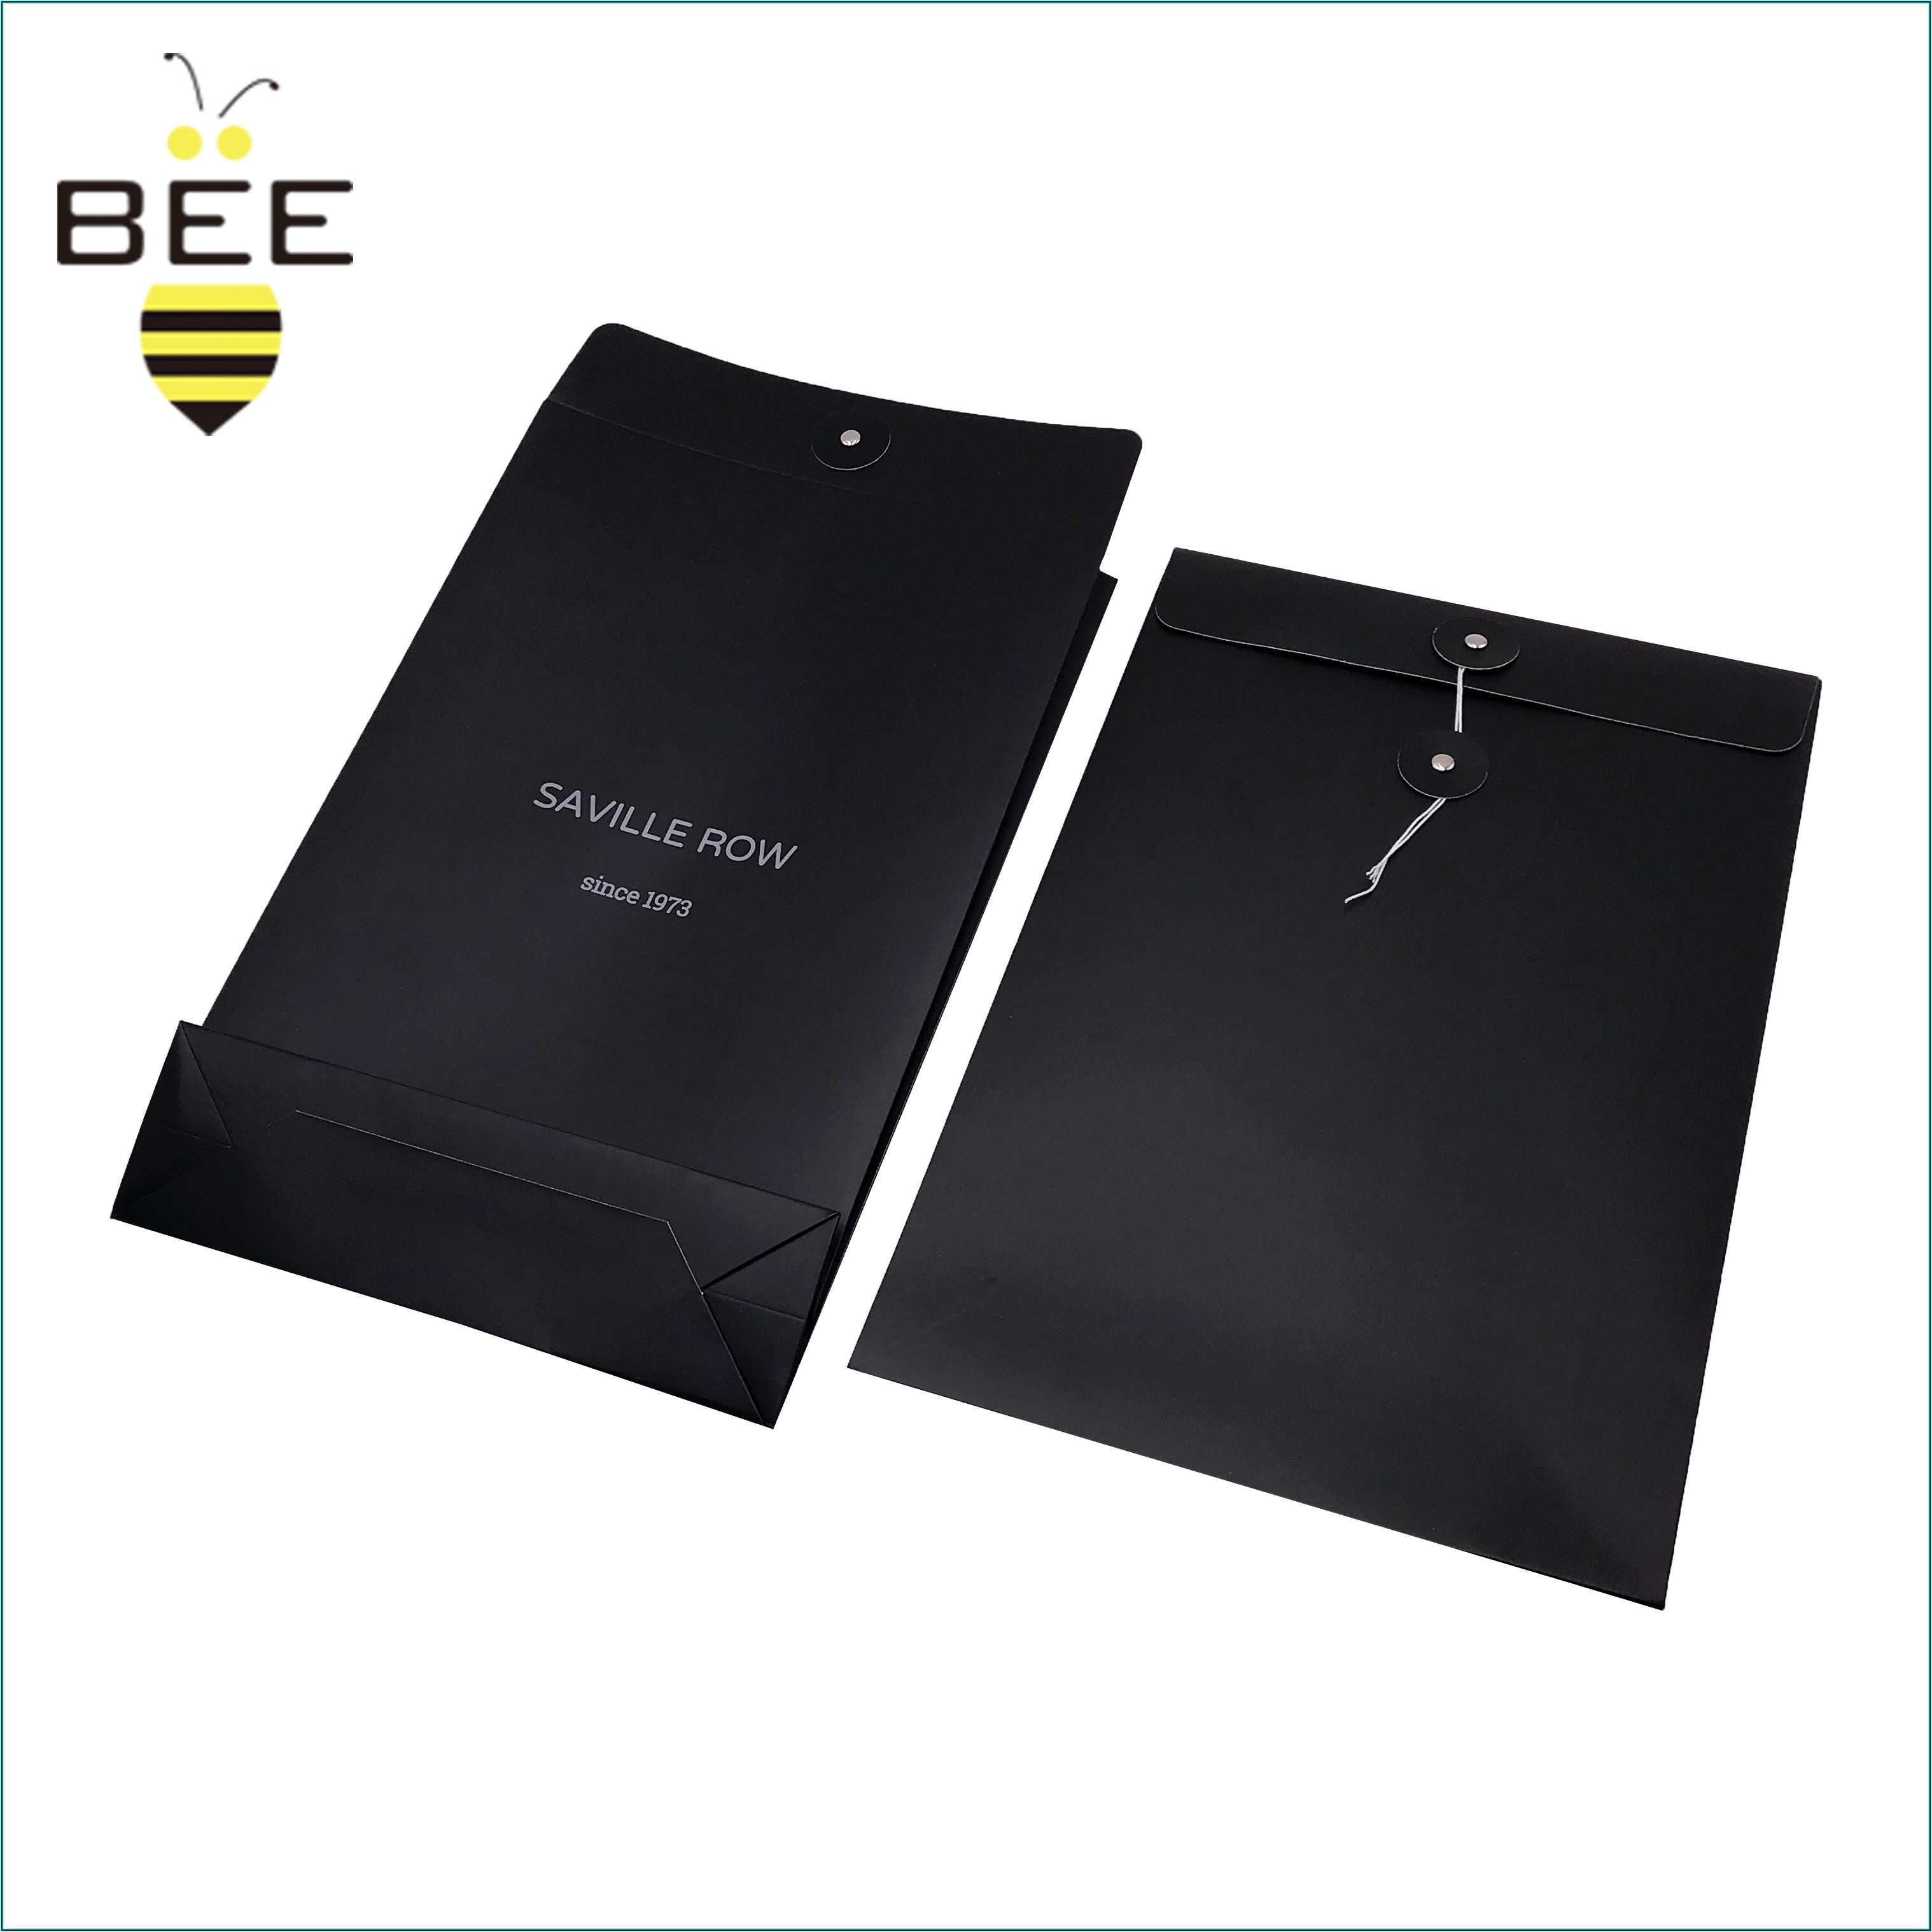 C5 String And Washer Envelopes